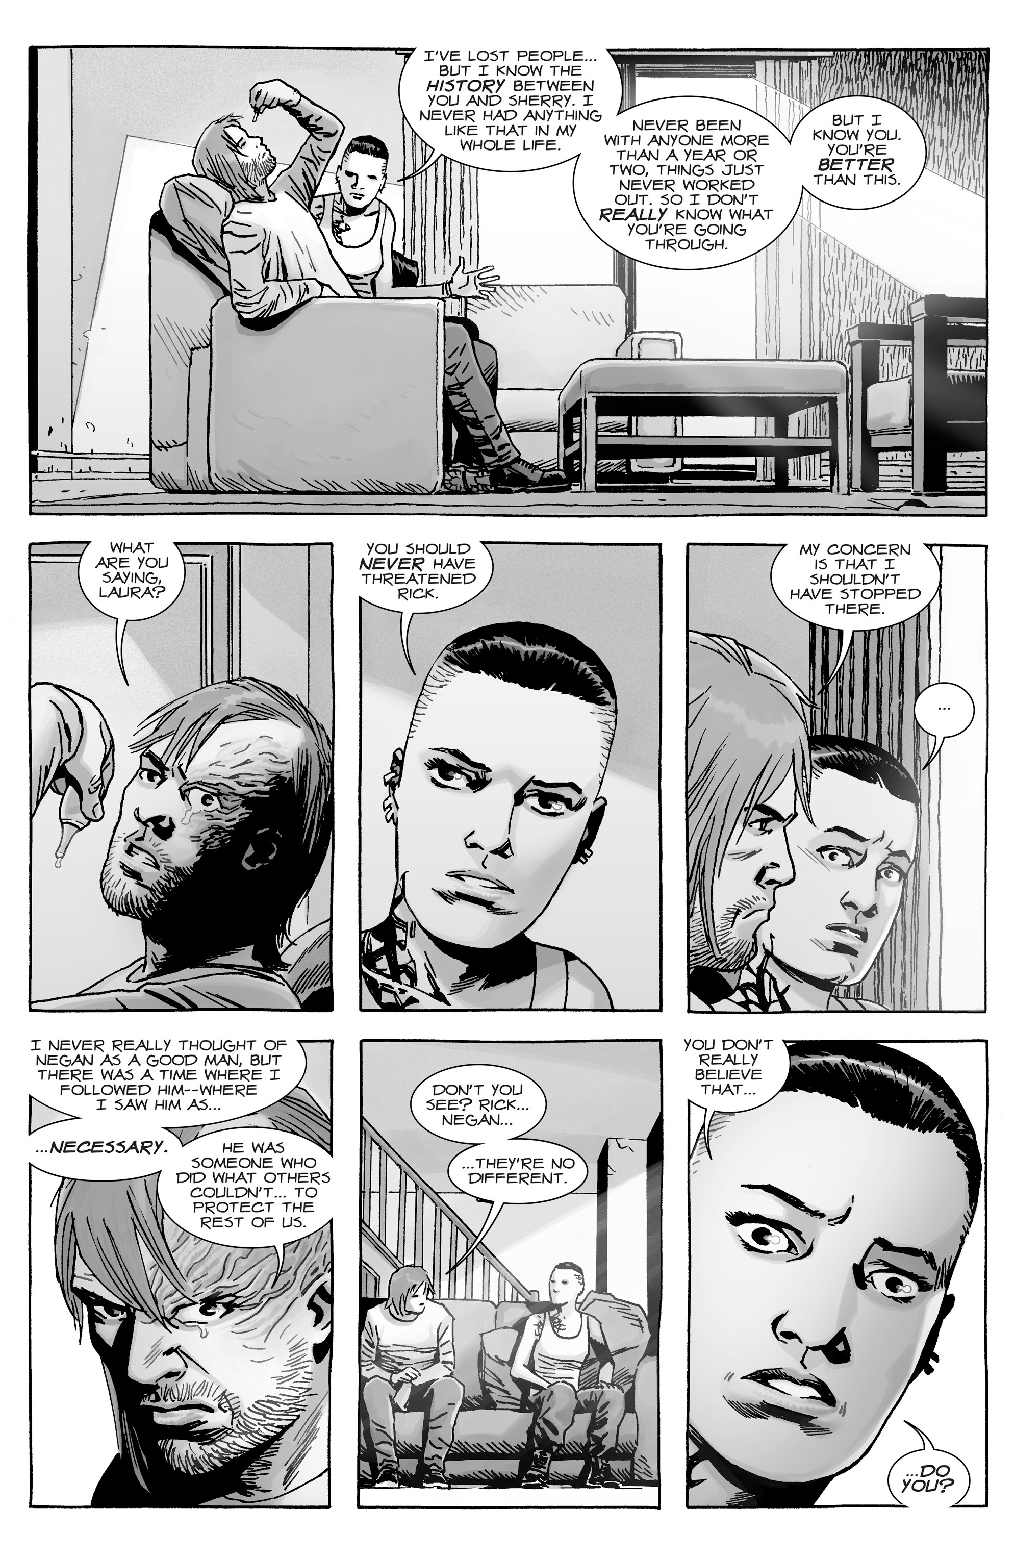 Read Comics Online Free - The Walking Dead - Chapter 170